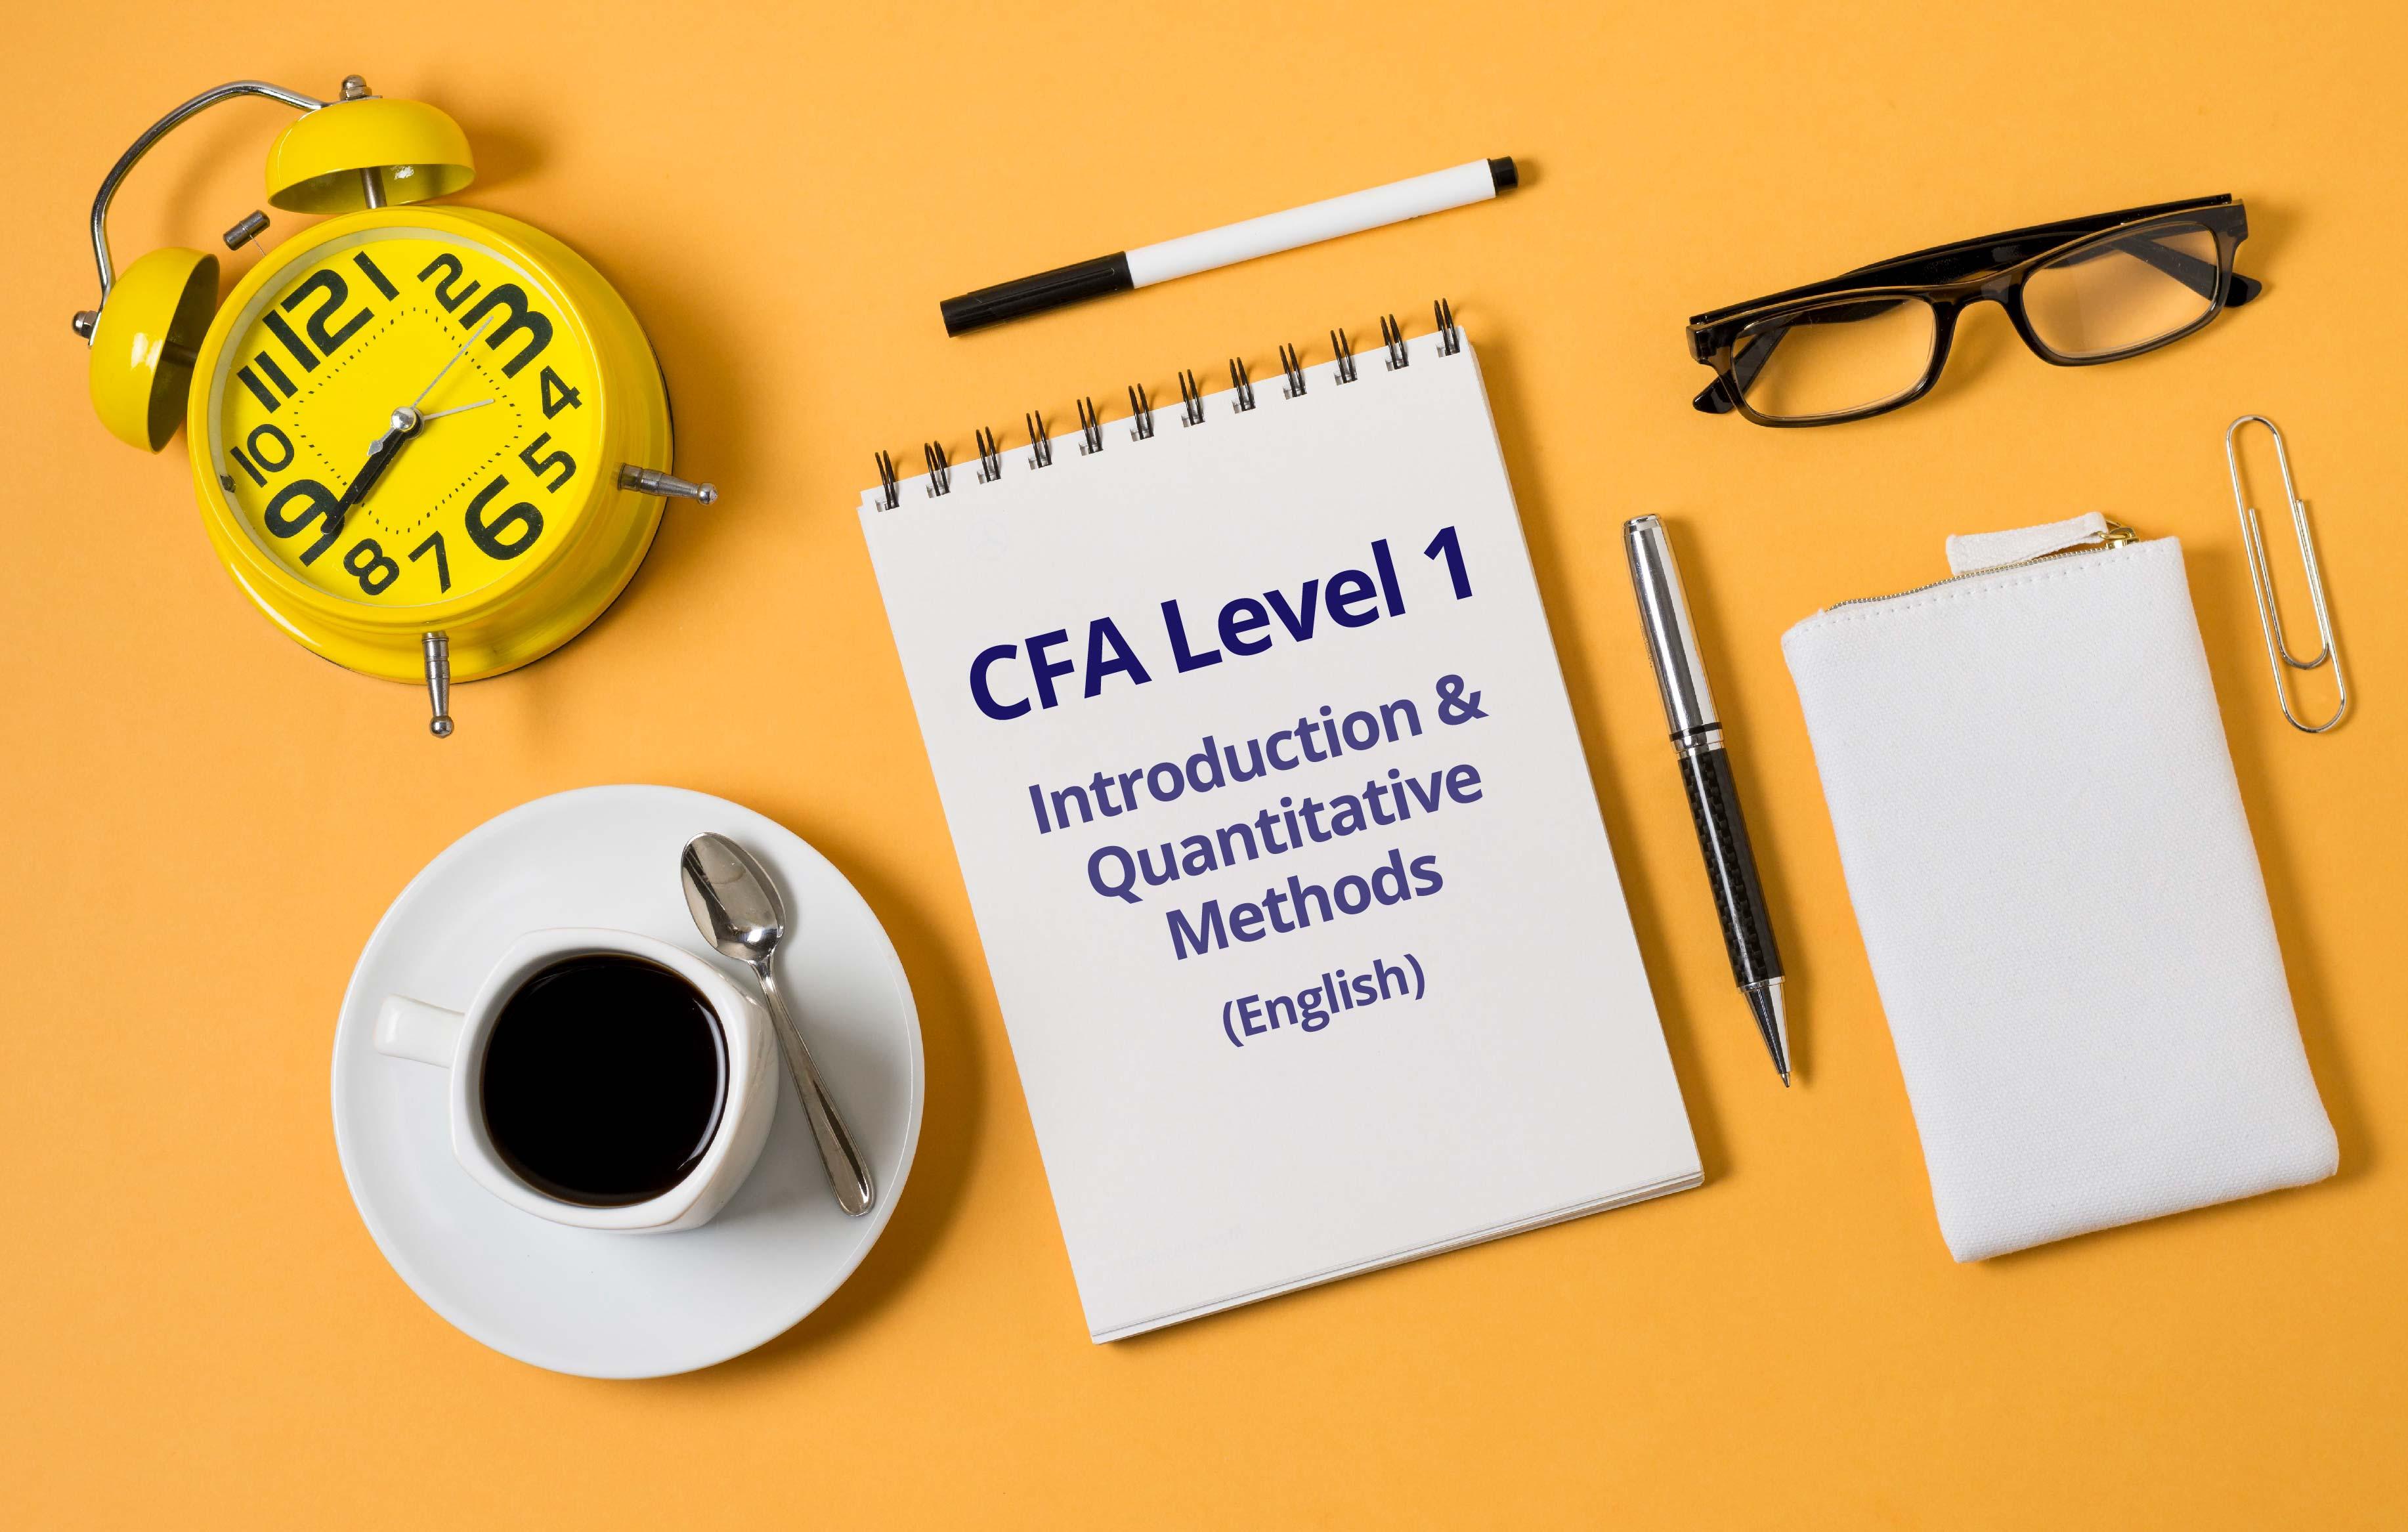 Course Image CFA Level 1 (English)